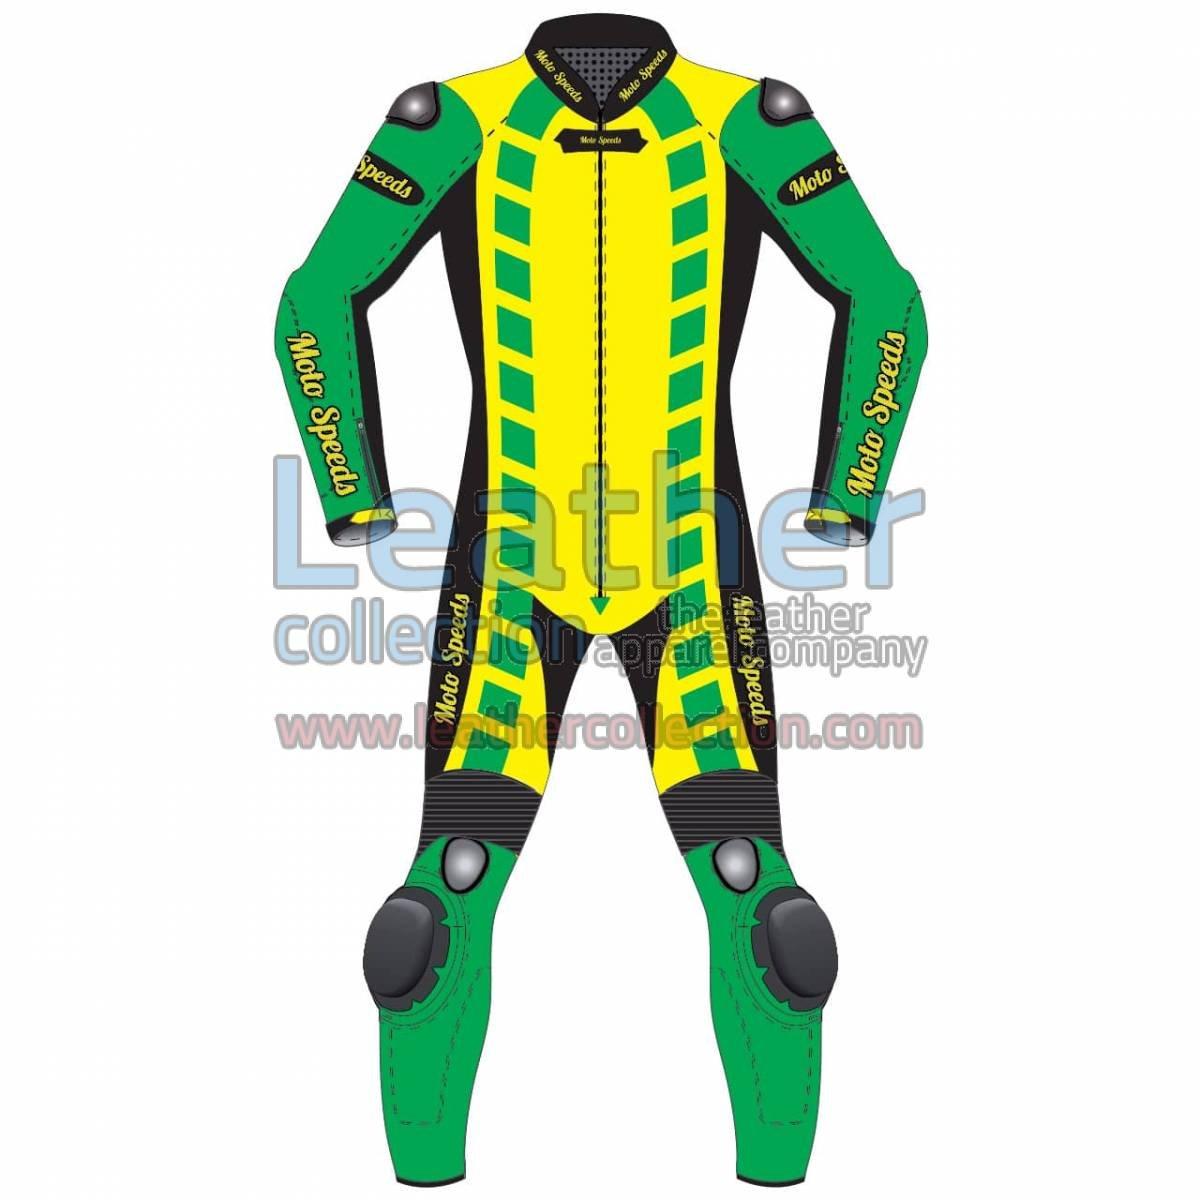 Diamond Leather Racing Suit